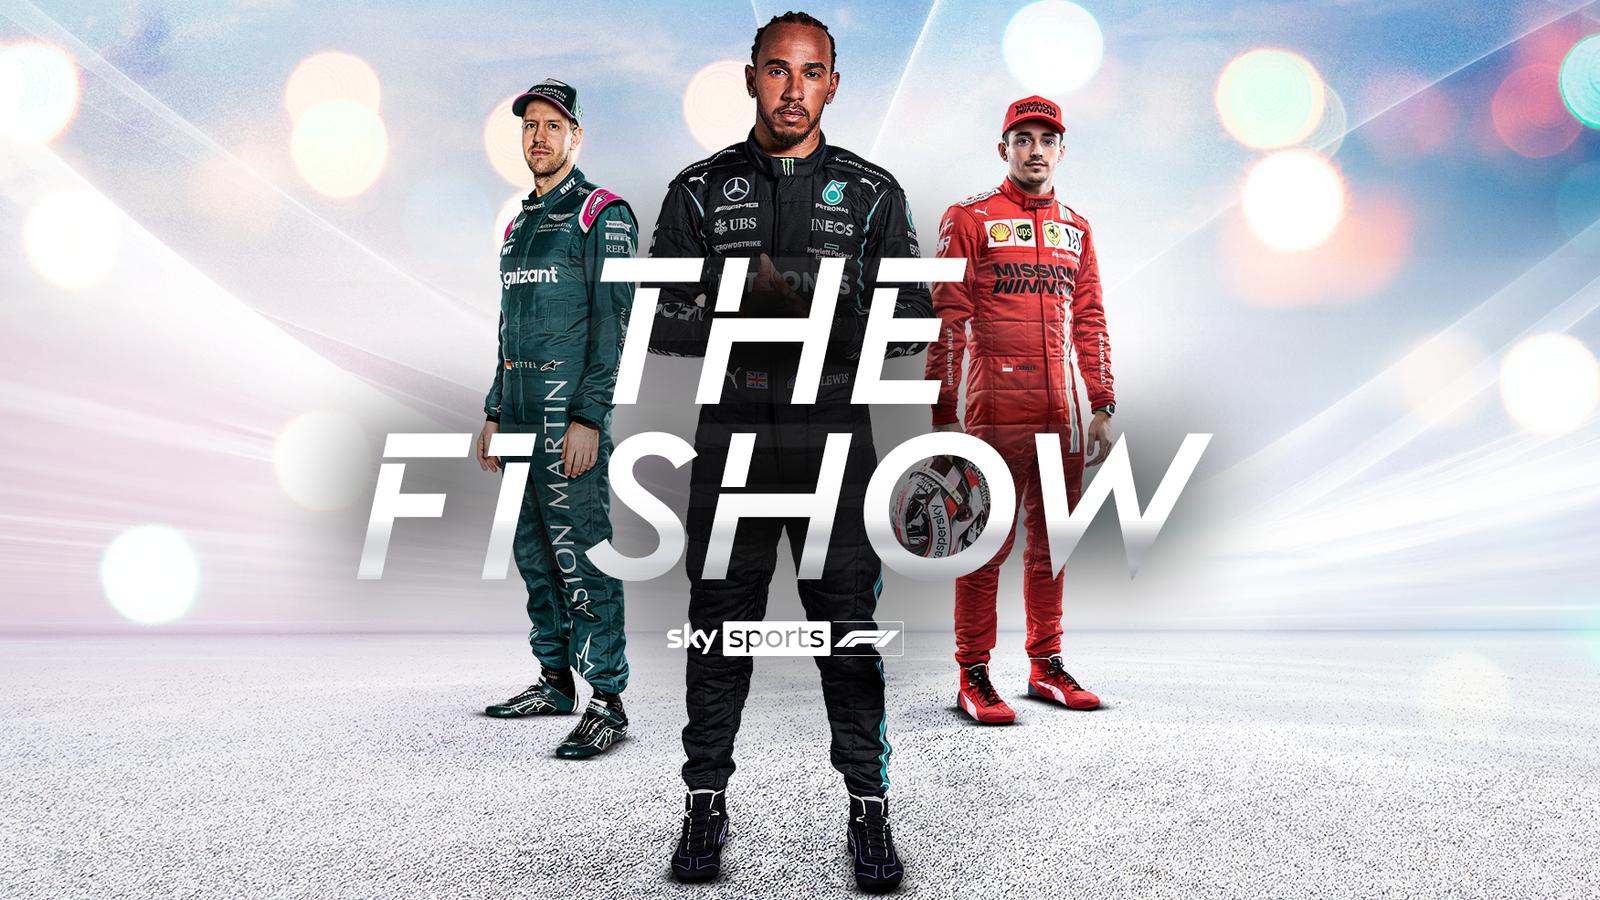 skysports-f1-show-2021-sky_5360107.png